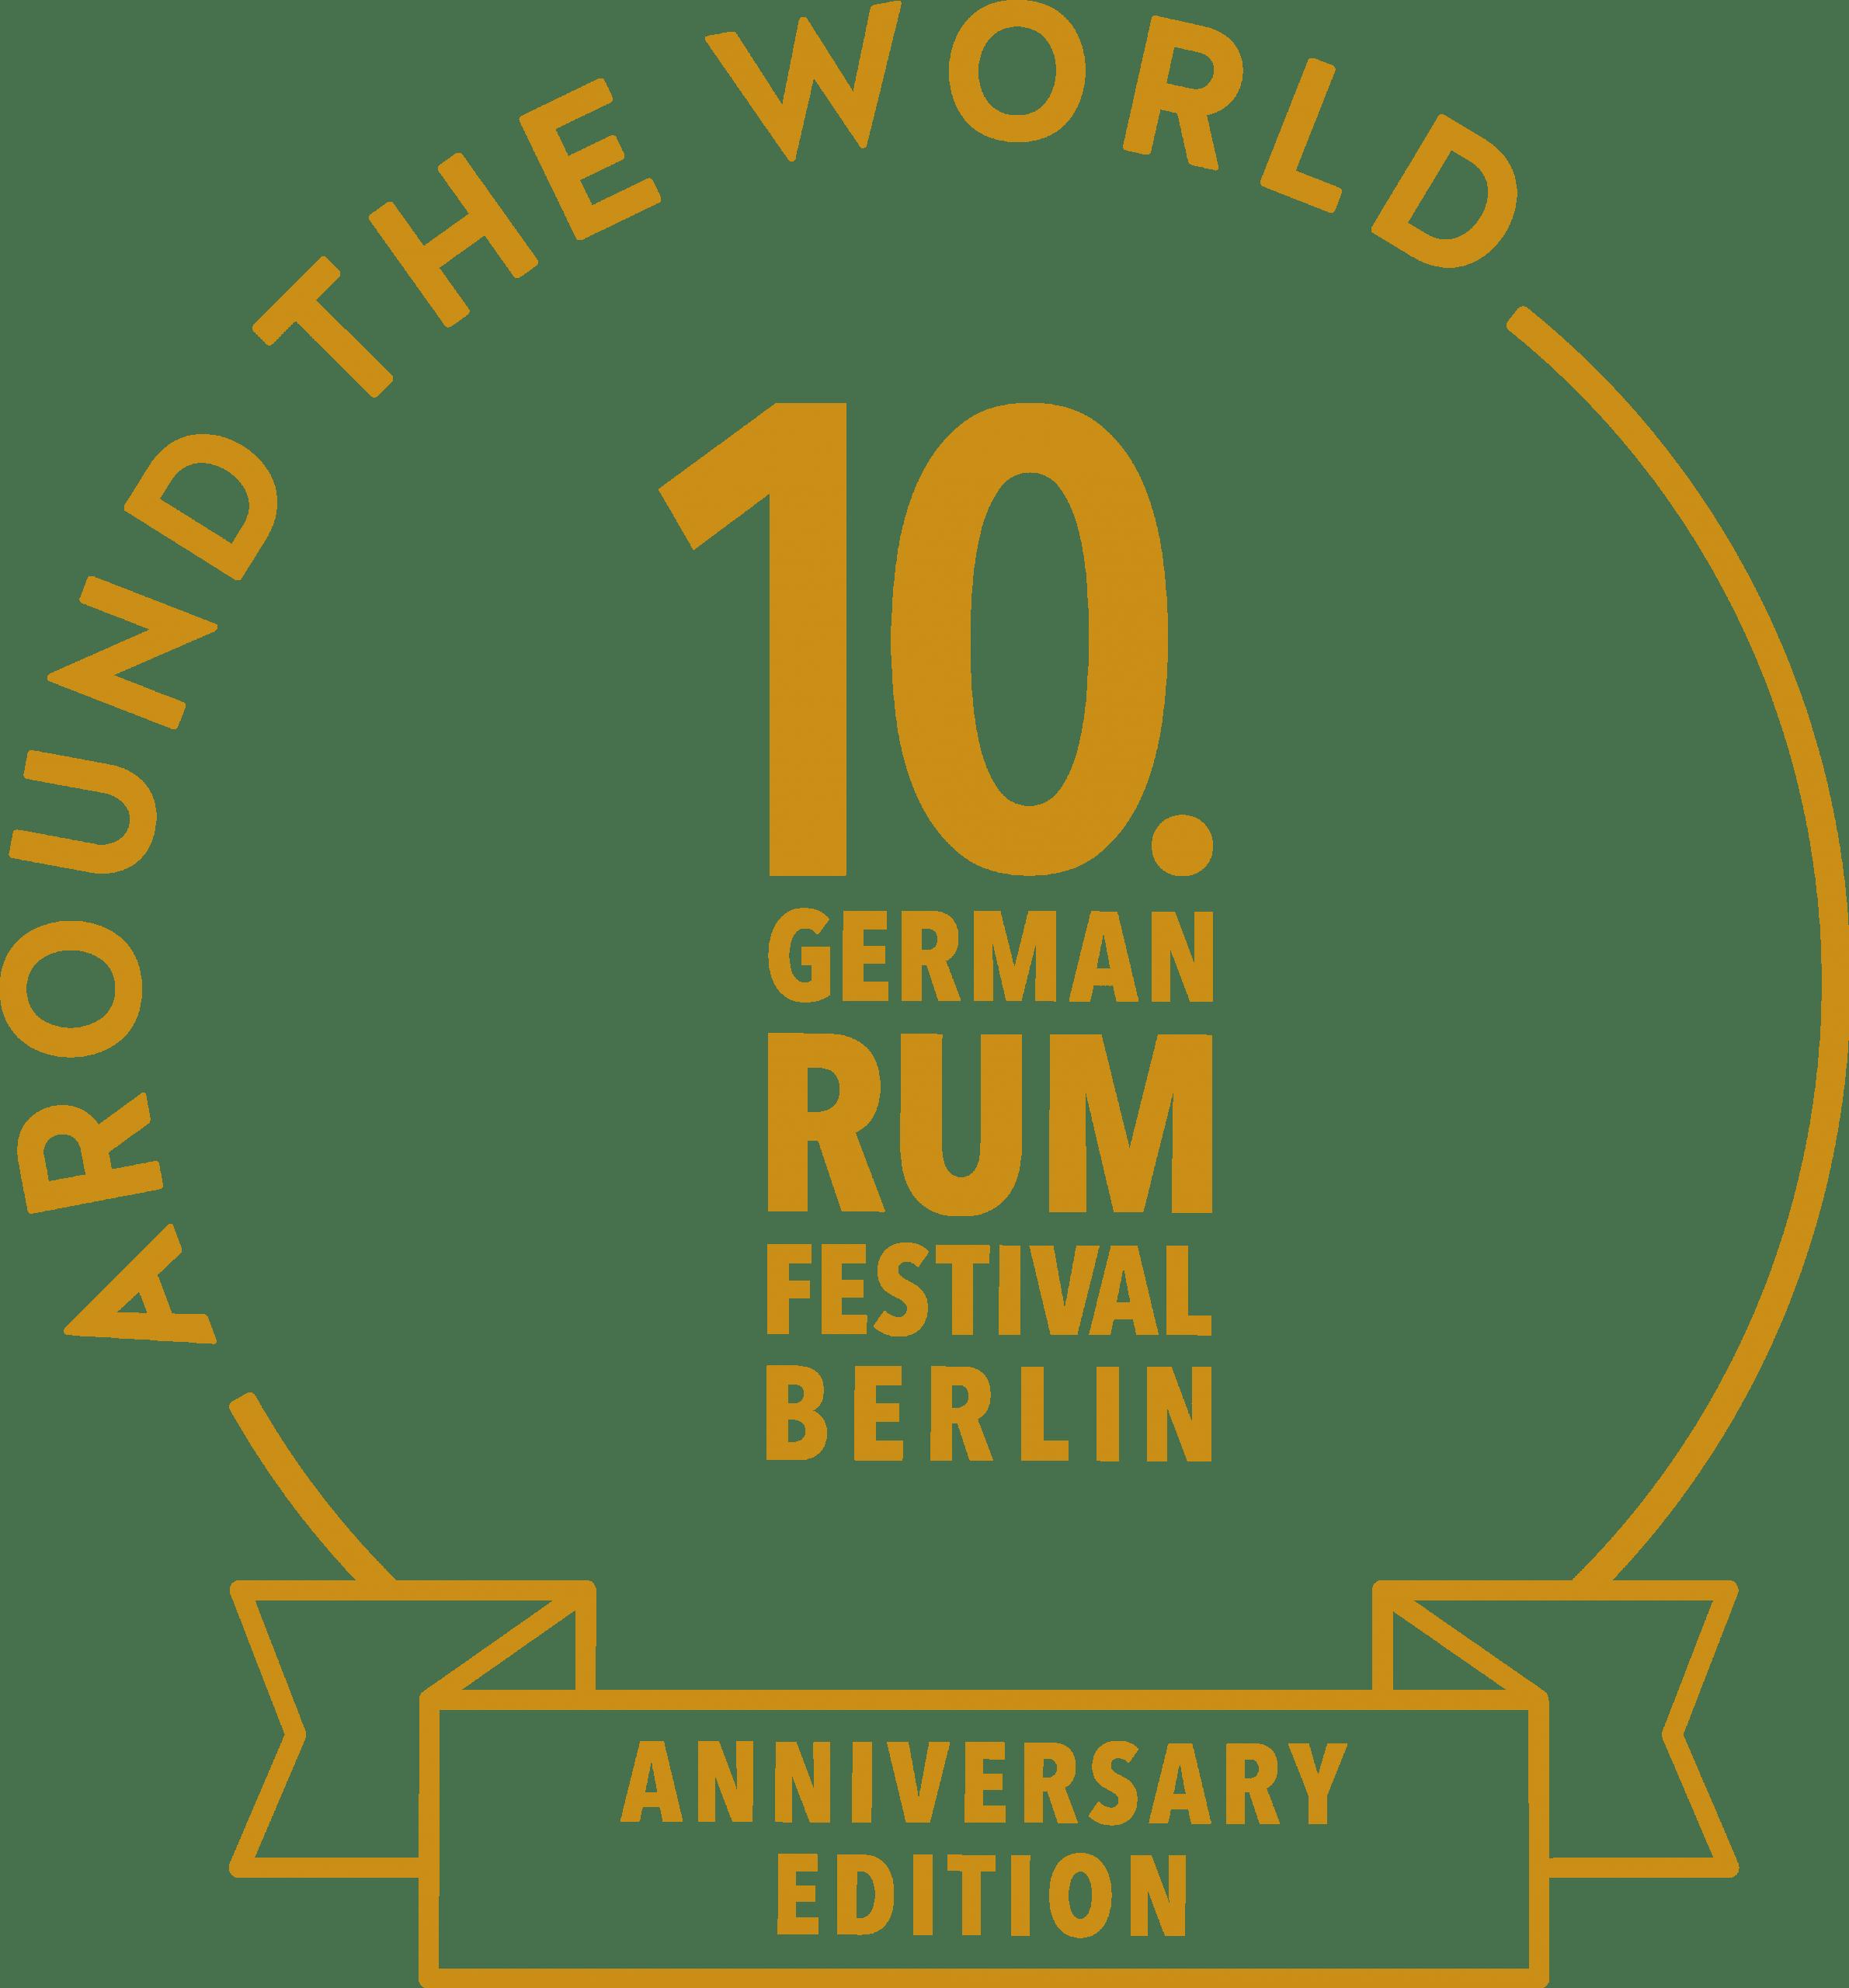 10th German Rumfestival News